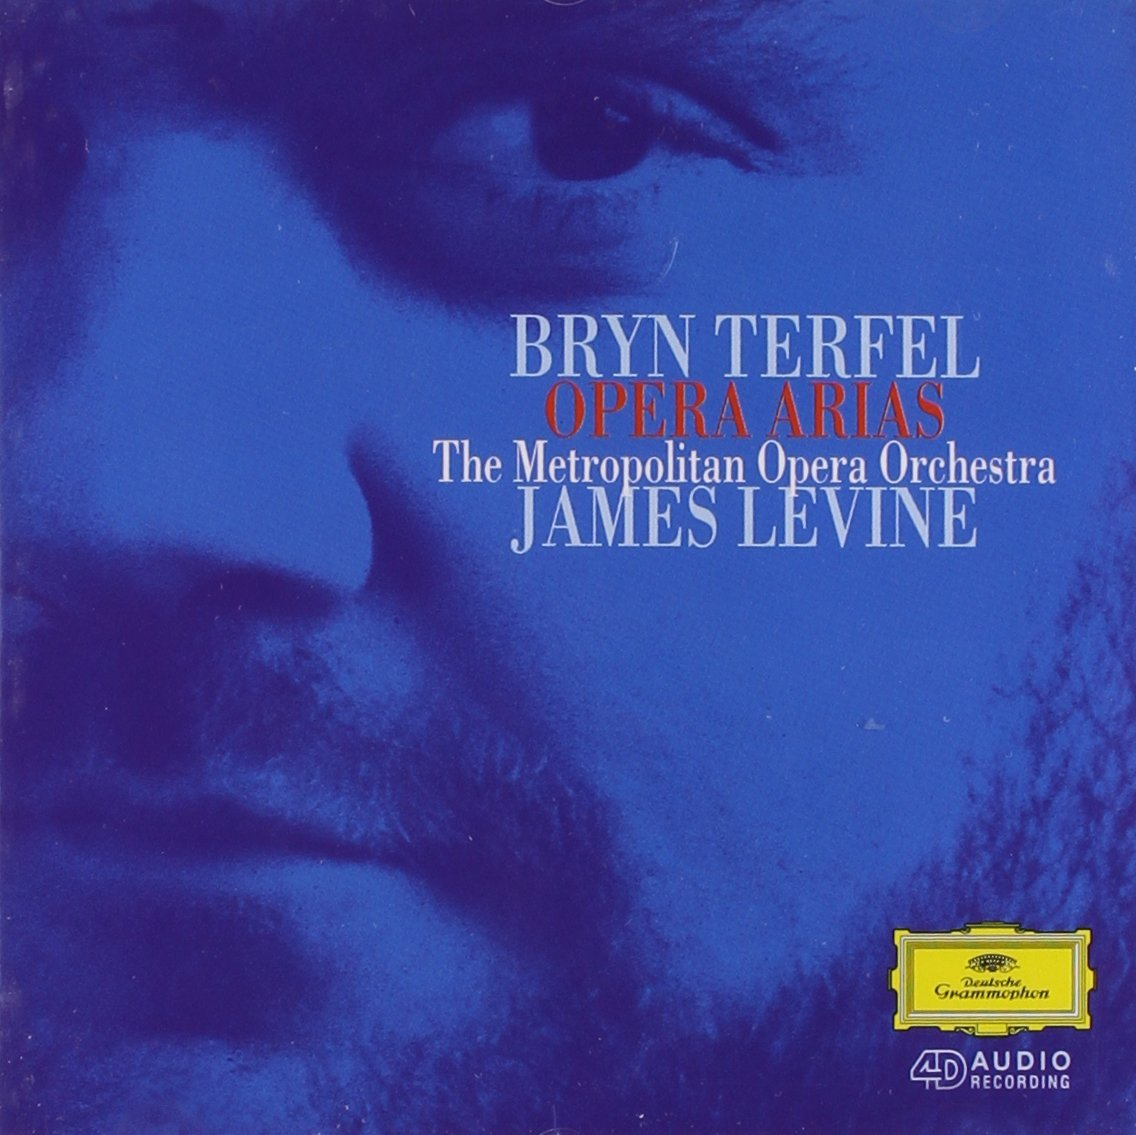 1997 - Terfel: Opera Arias (Levine, Cond.)